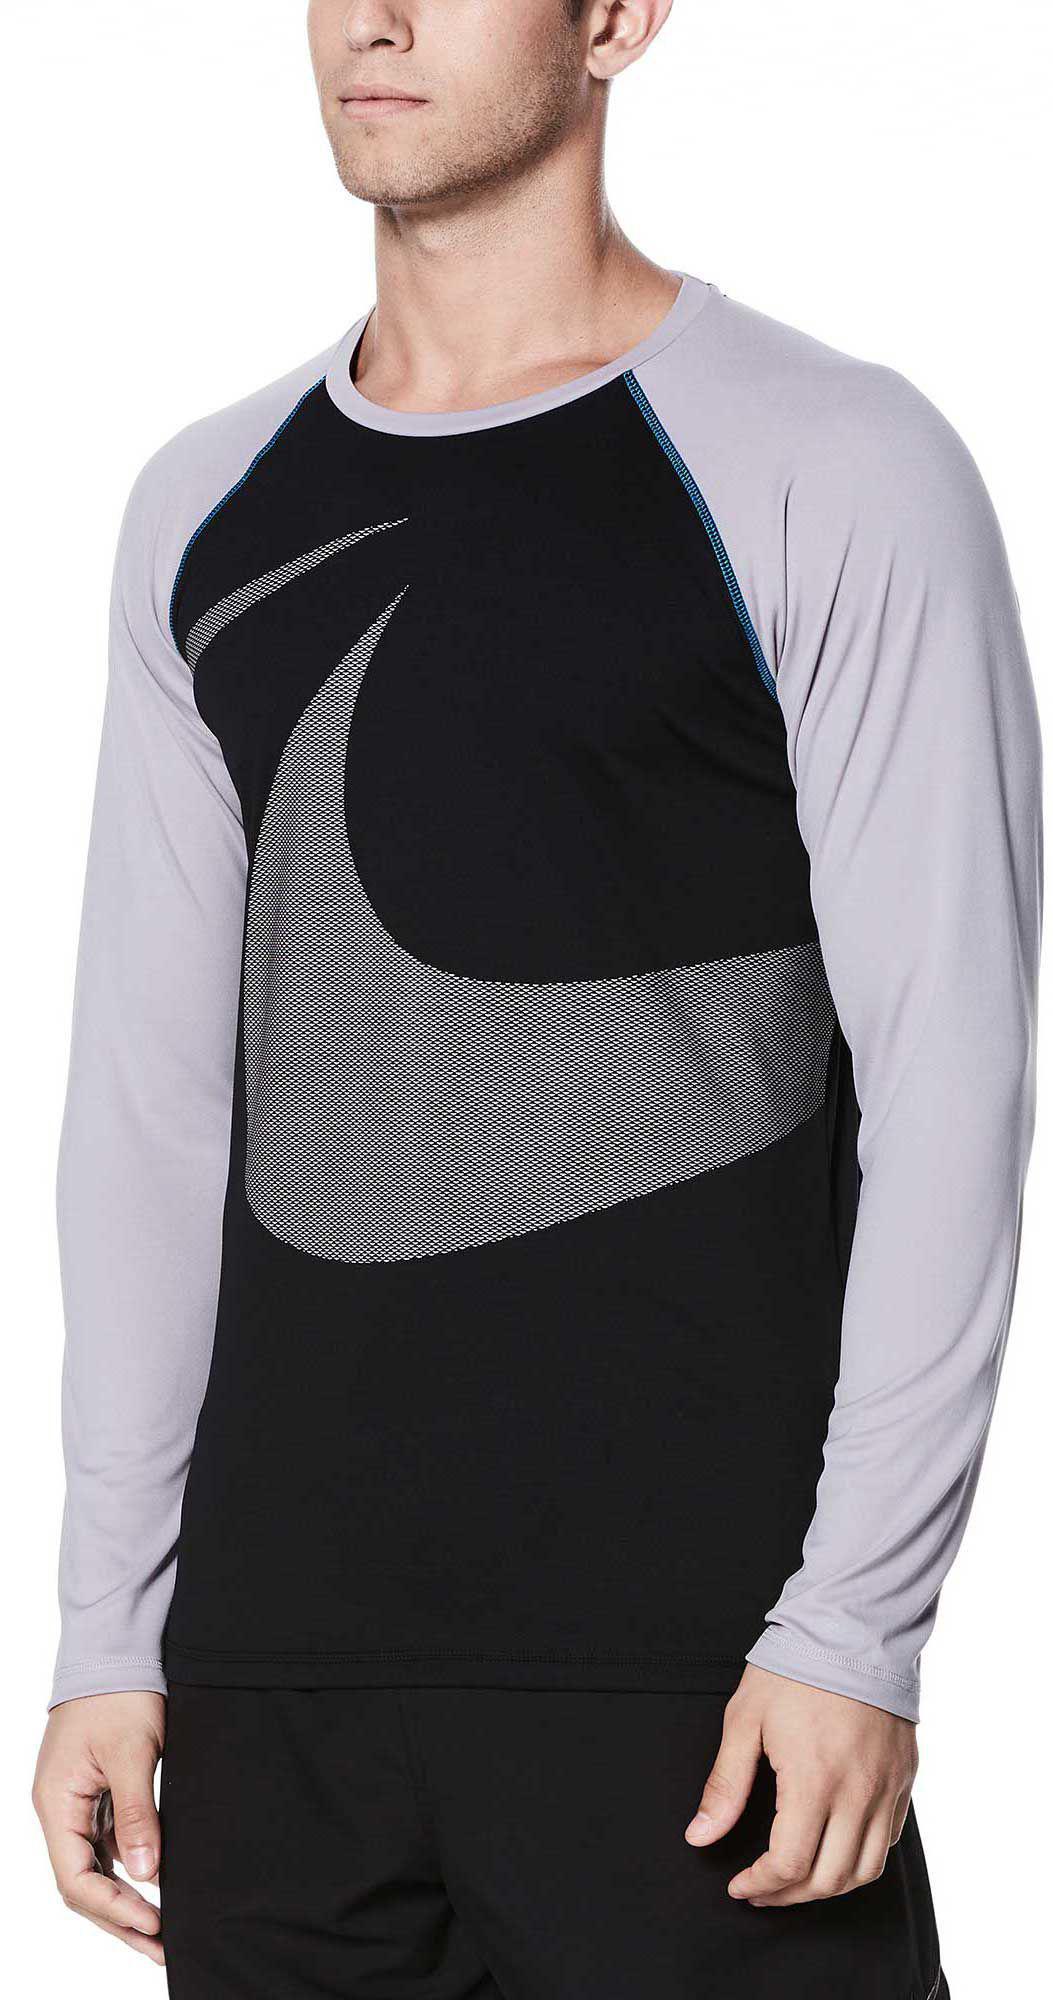 70fec2a5 Lyst - Nike Macro Swoosh Long Sleeve Hydro Rash Guard in Black for Men